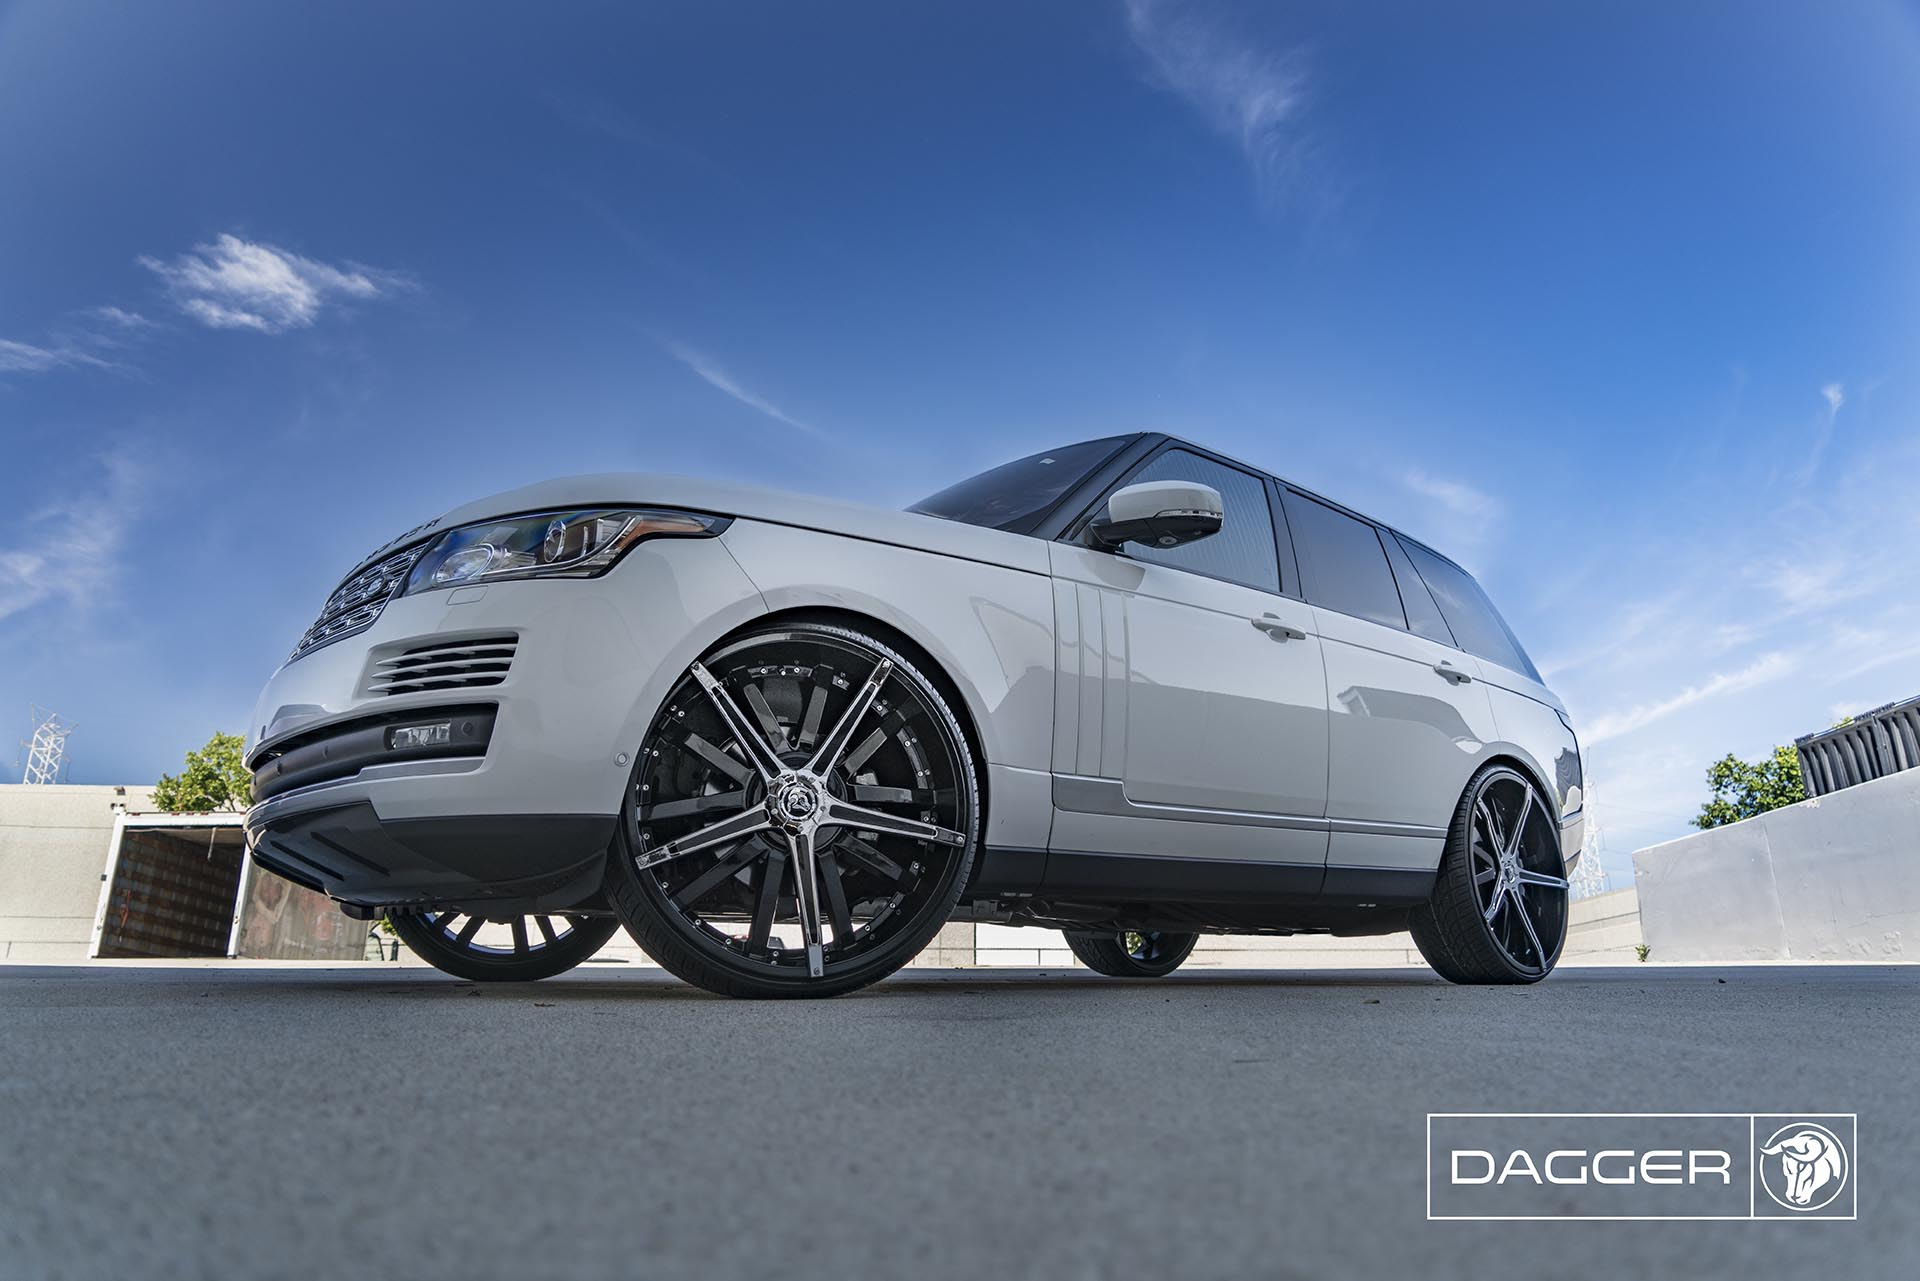 Black Diablo Dagger Wheels on a Land Rover Range Rover